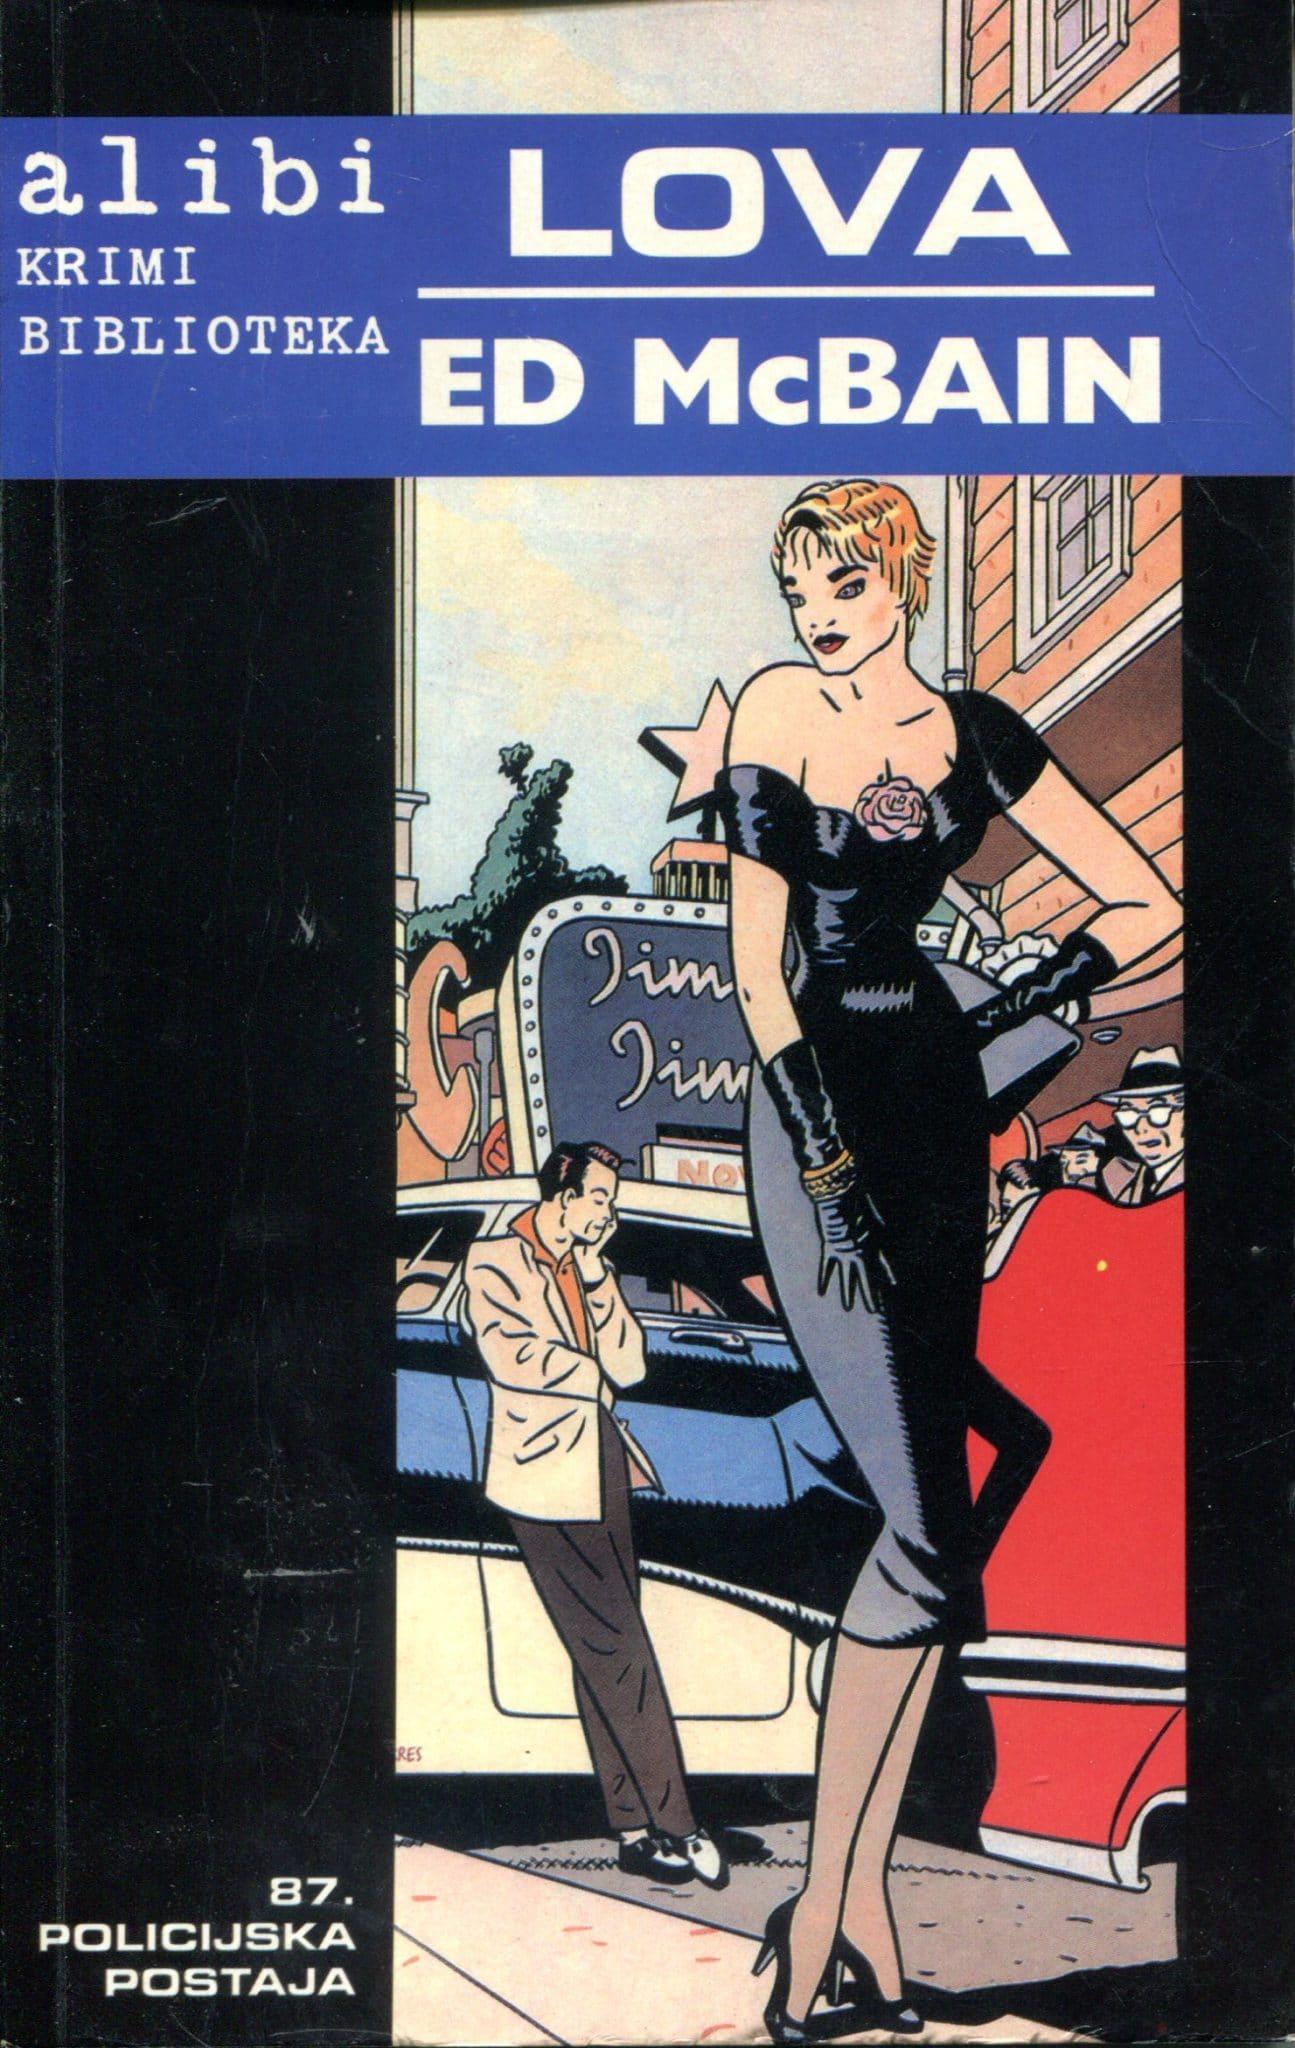 Lova McBain Ed